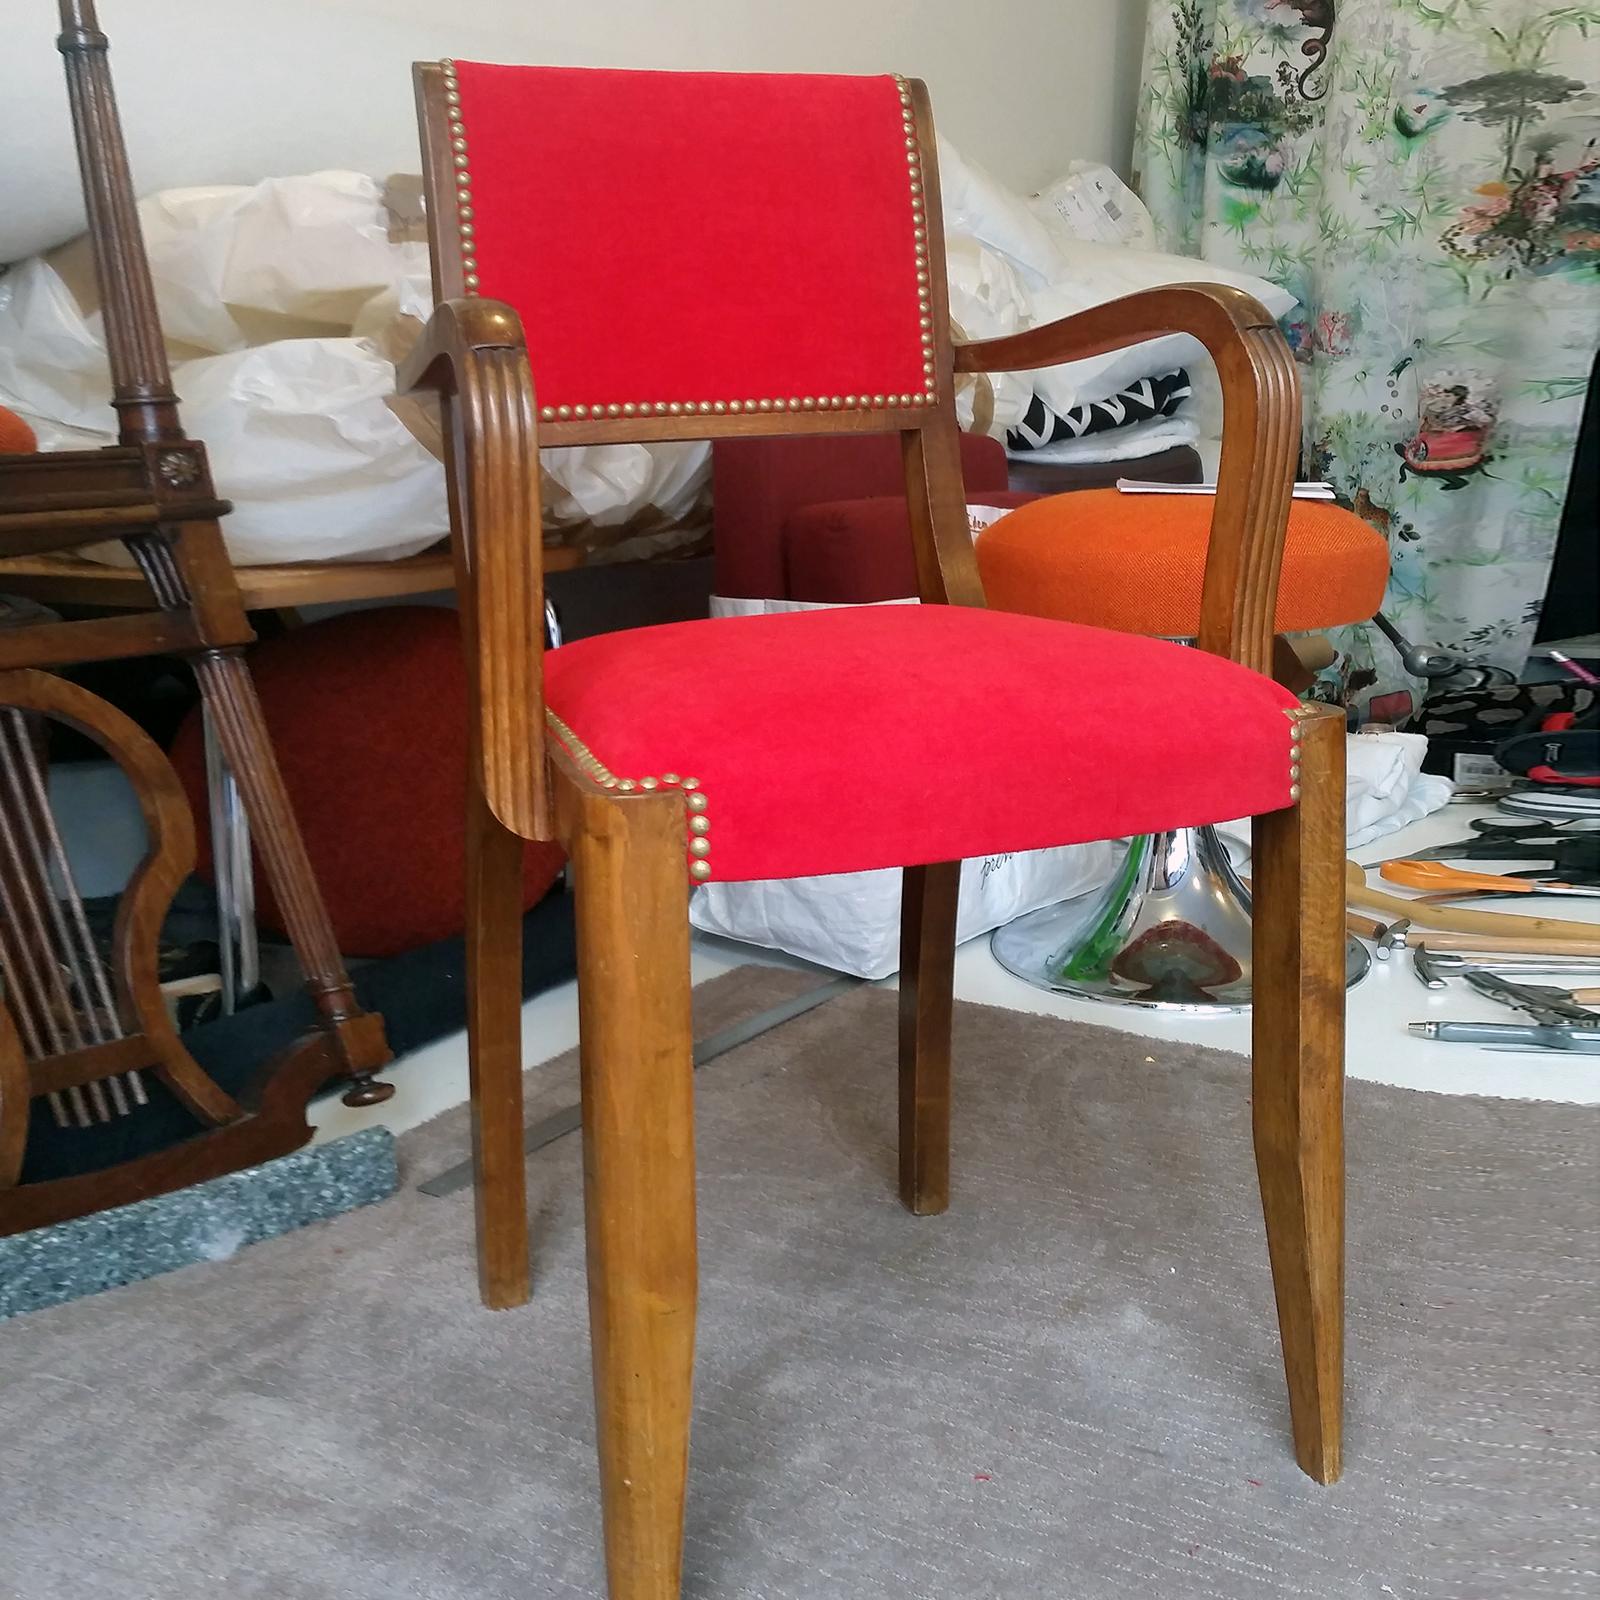 Tapissier Paris 20 atelier velvet | artisan tapissier paris 10e: bridge années 20